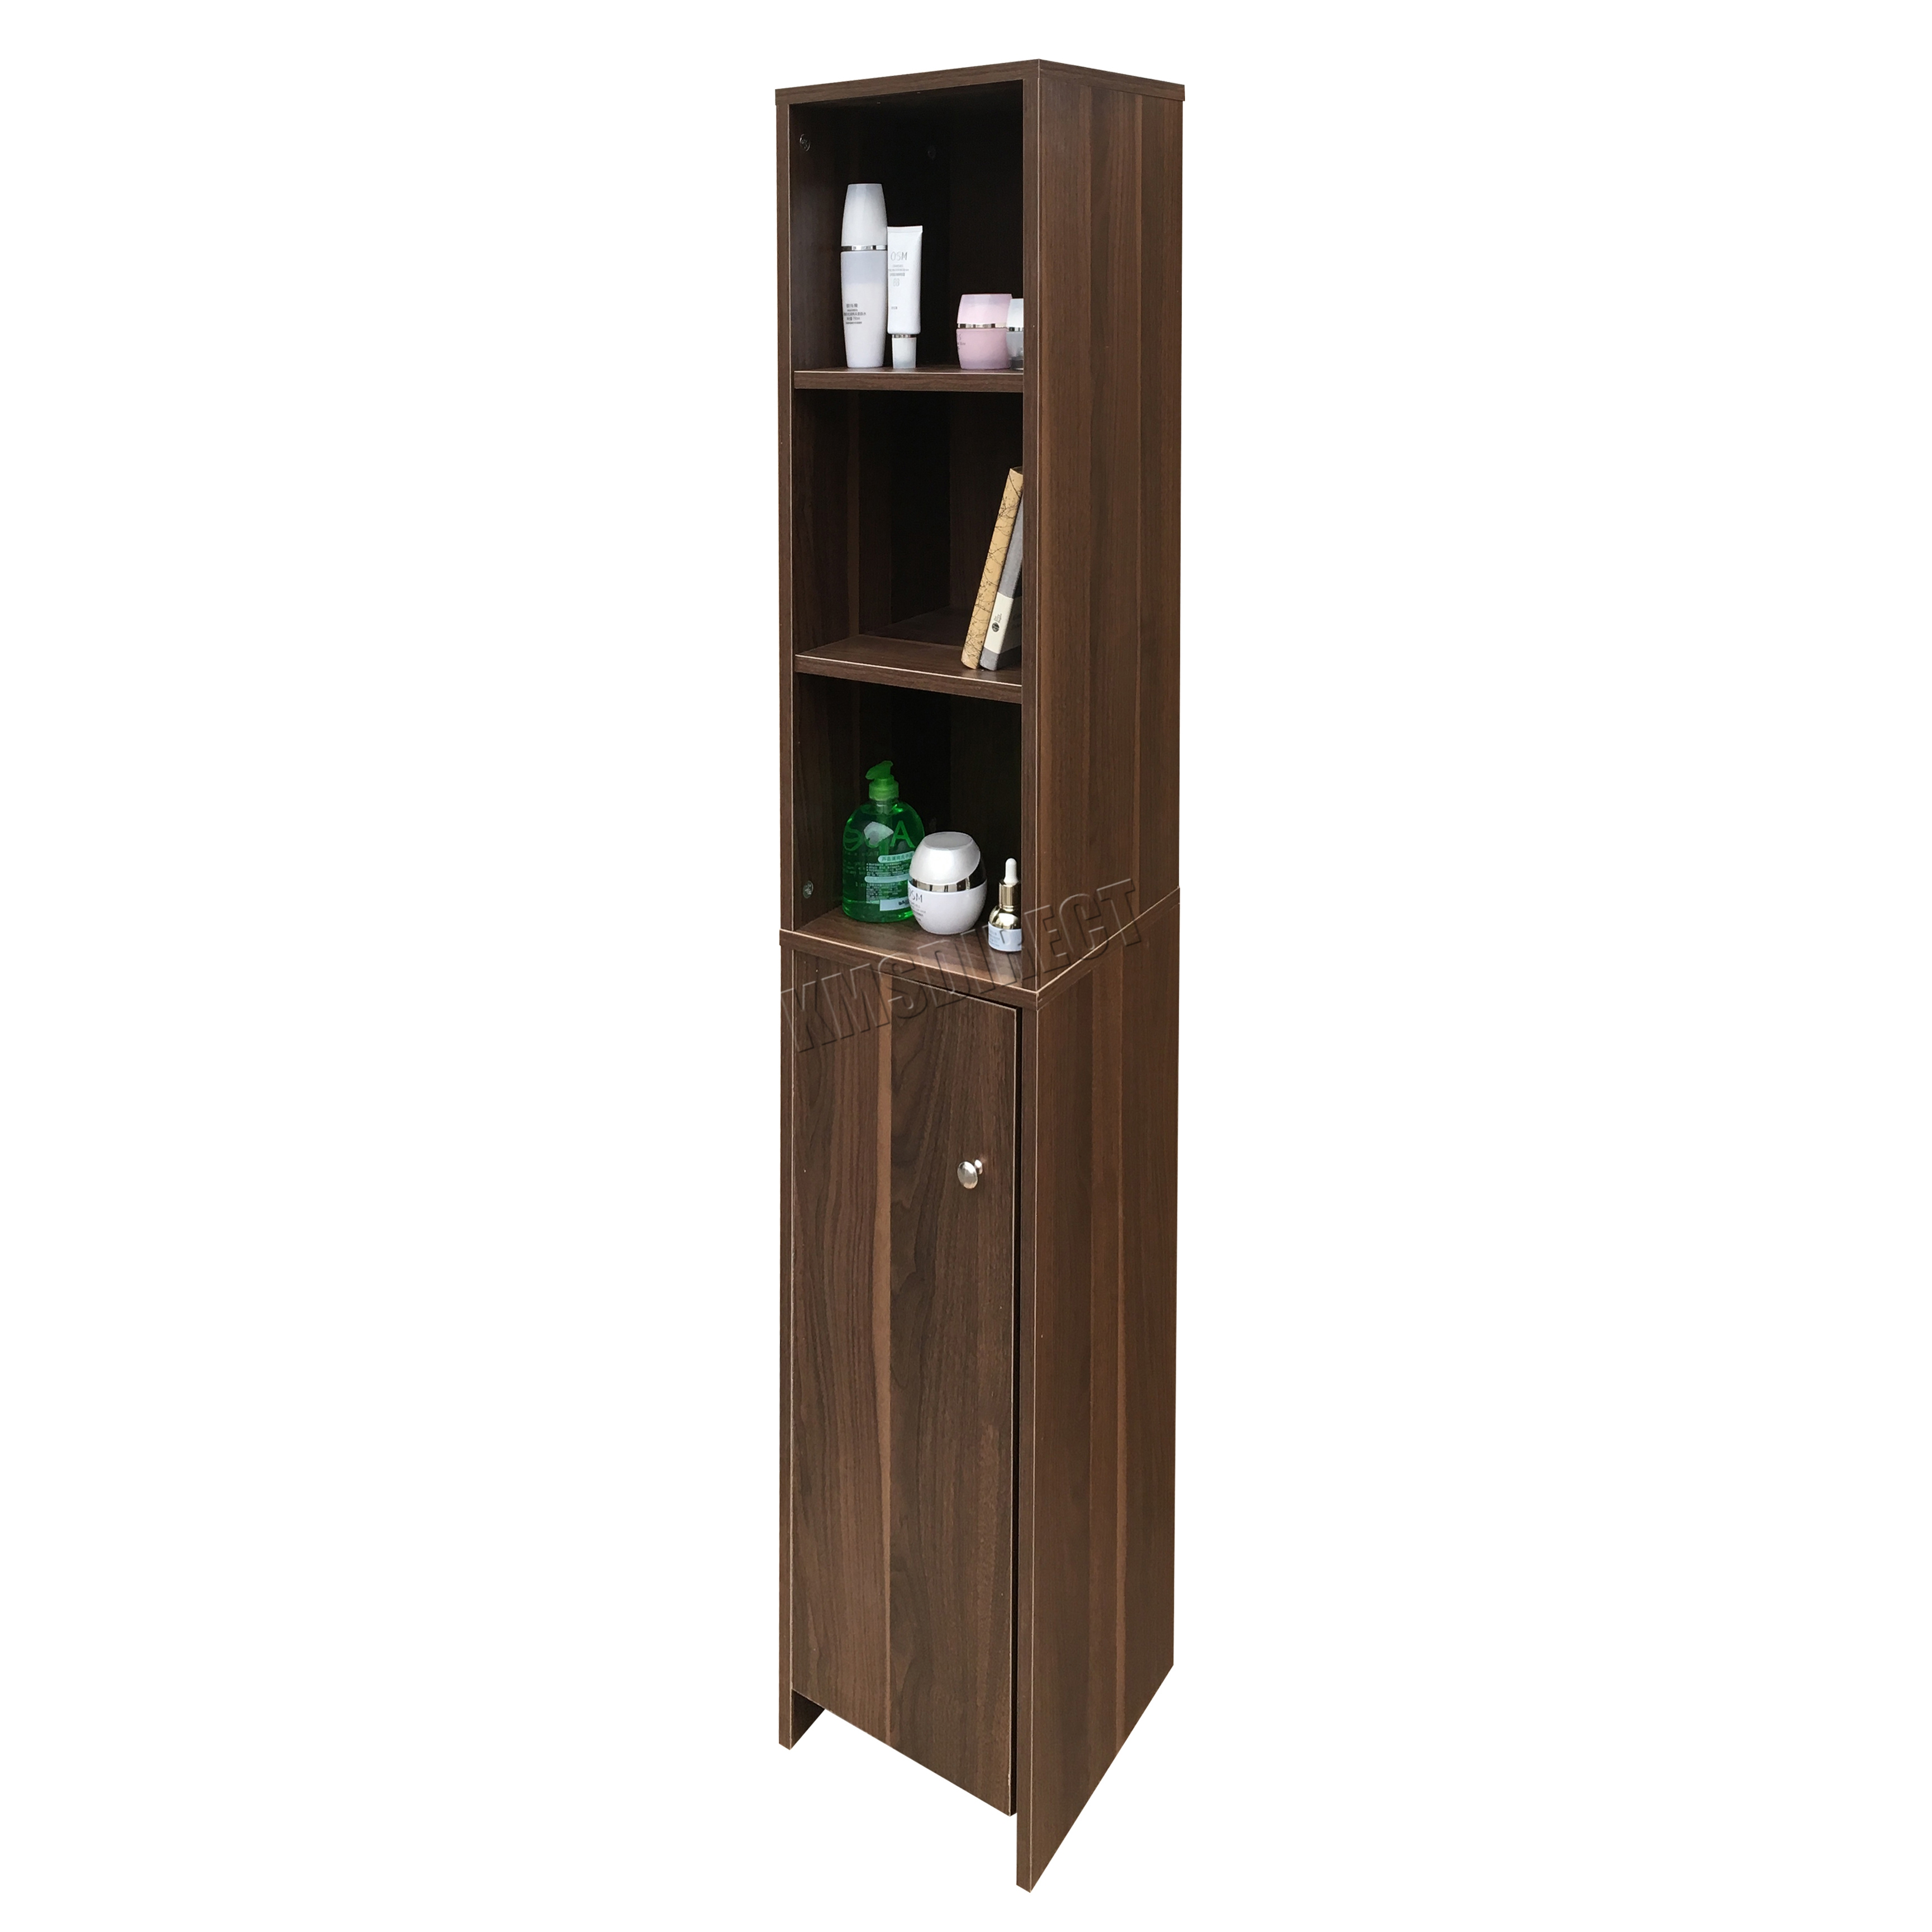 Foxhunter Wall Mount Wooden Bathroom Cabinet Tall Shelving Storage Tallboy Bc08 Ebay